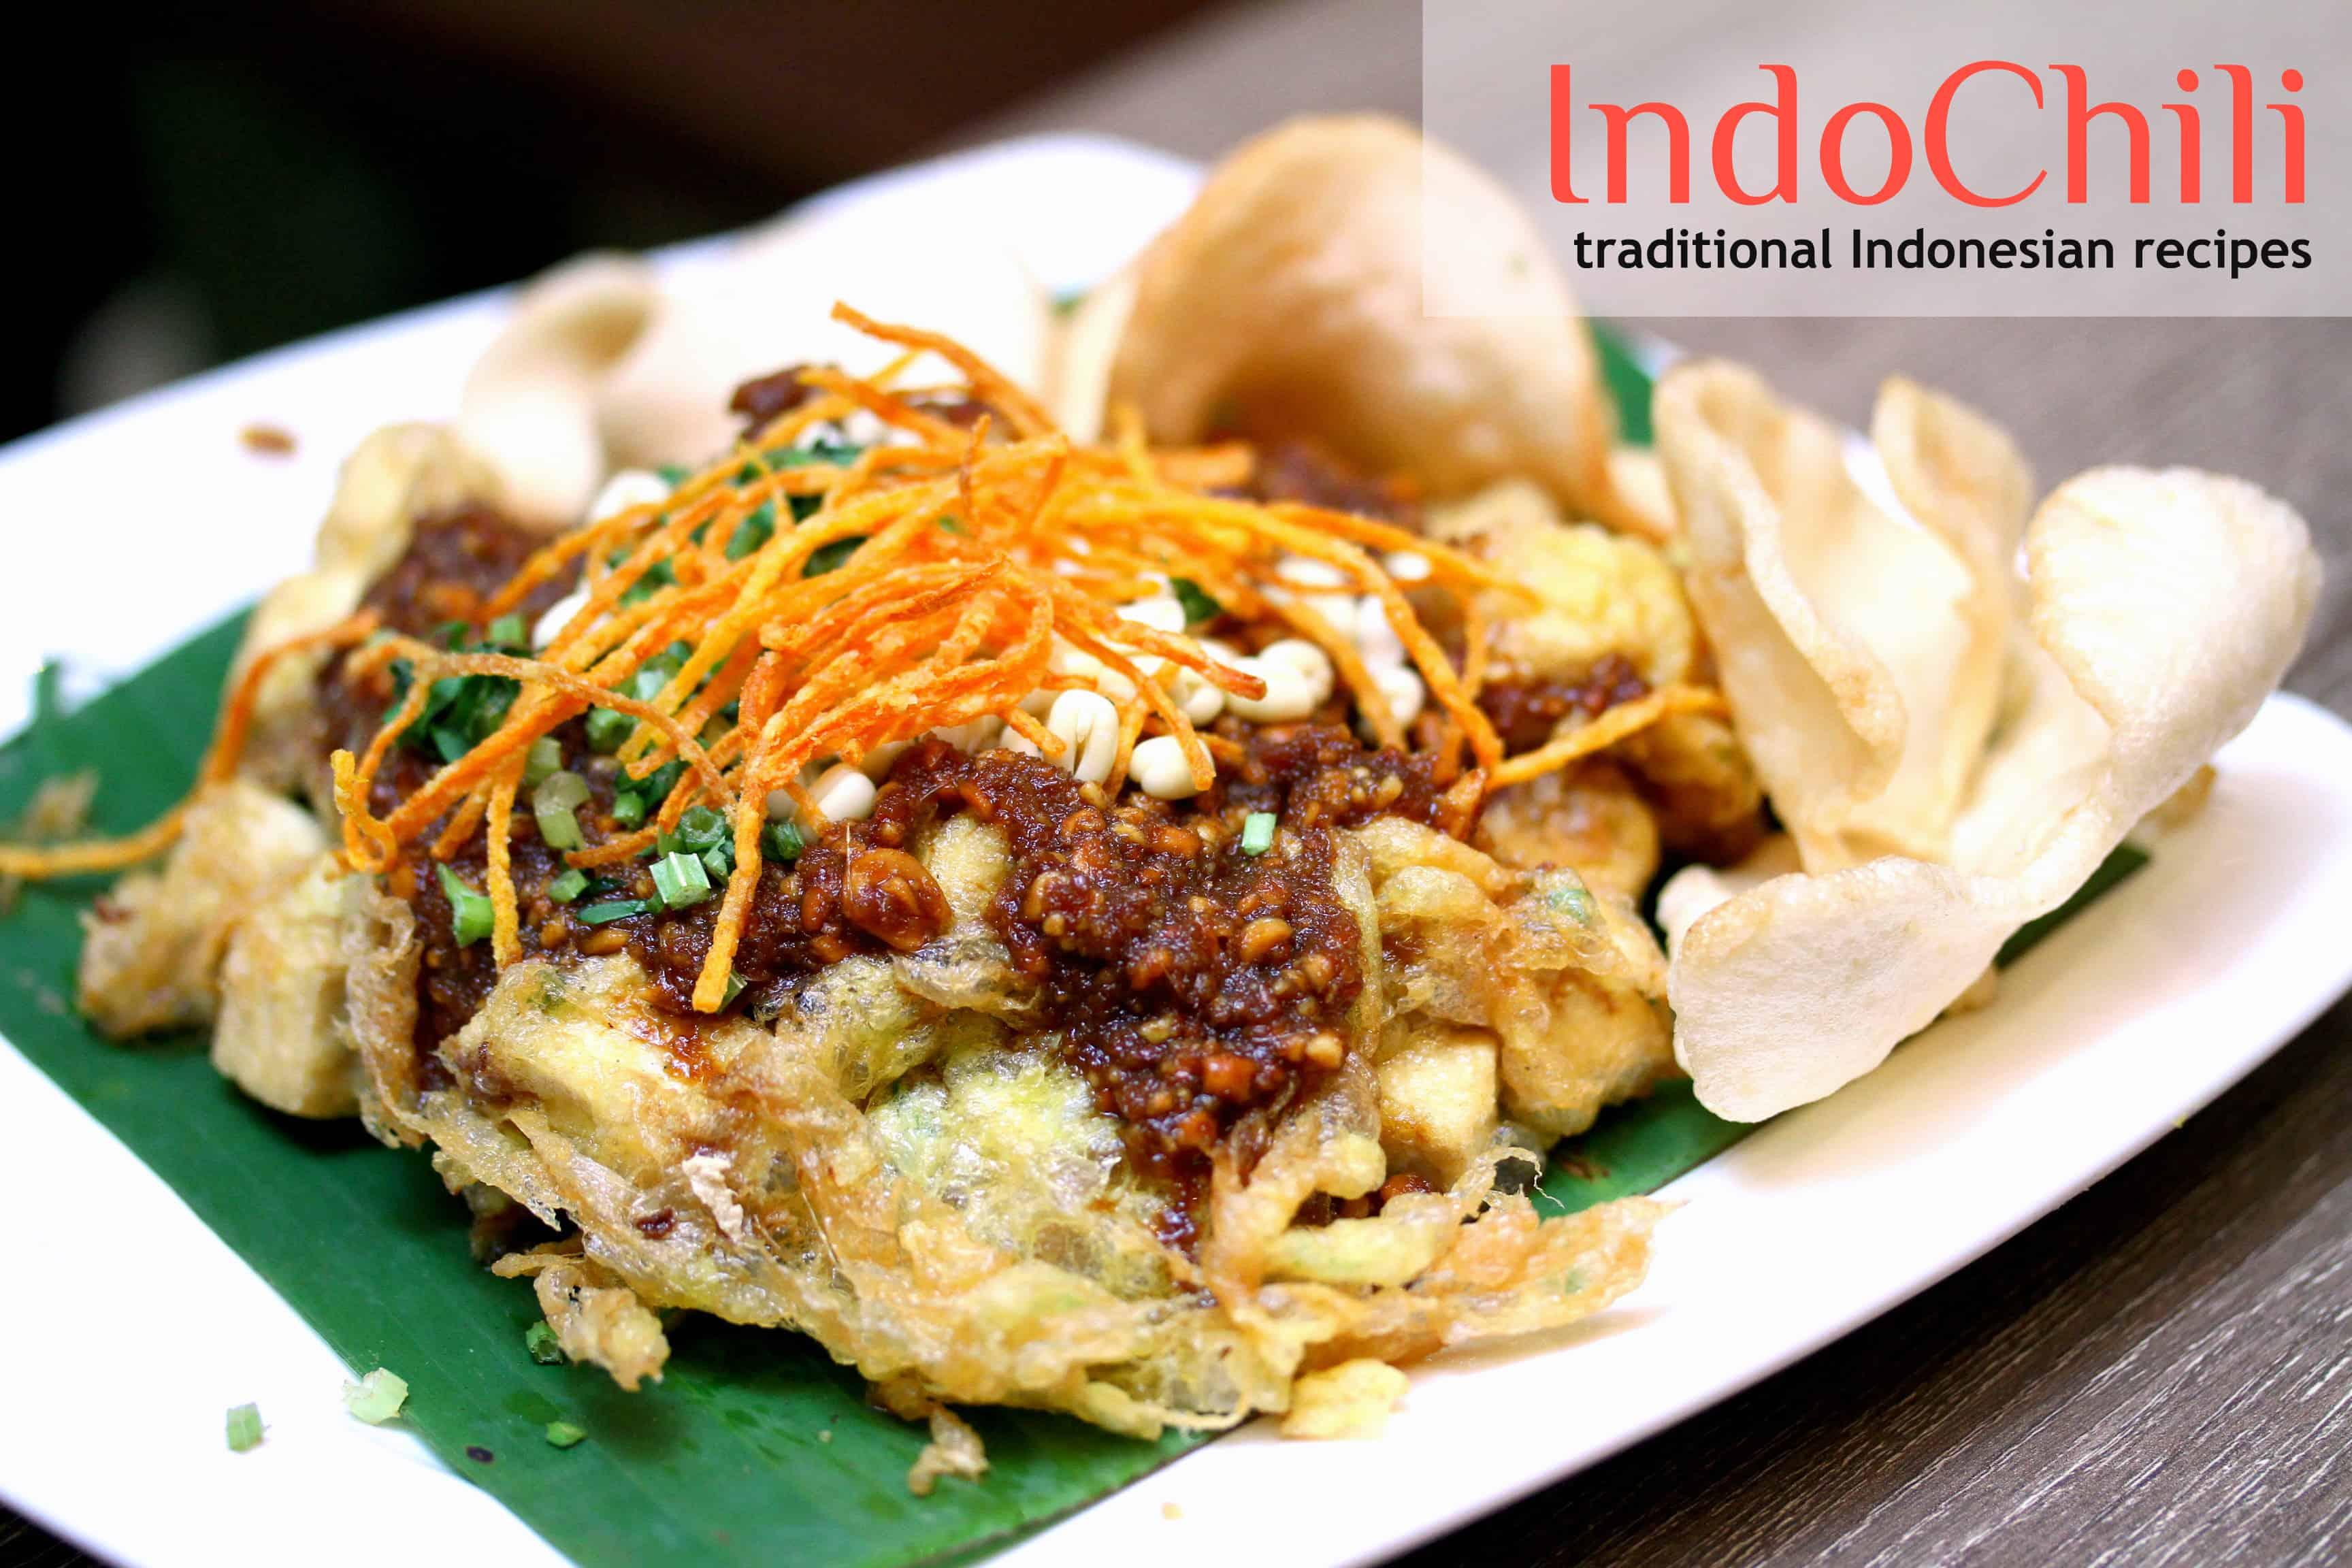 IndoChili - Traditional Indonesian Recipes - Miss Tam Chiak